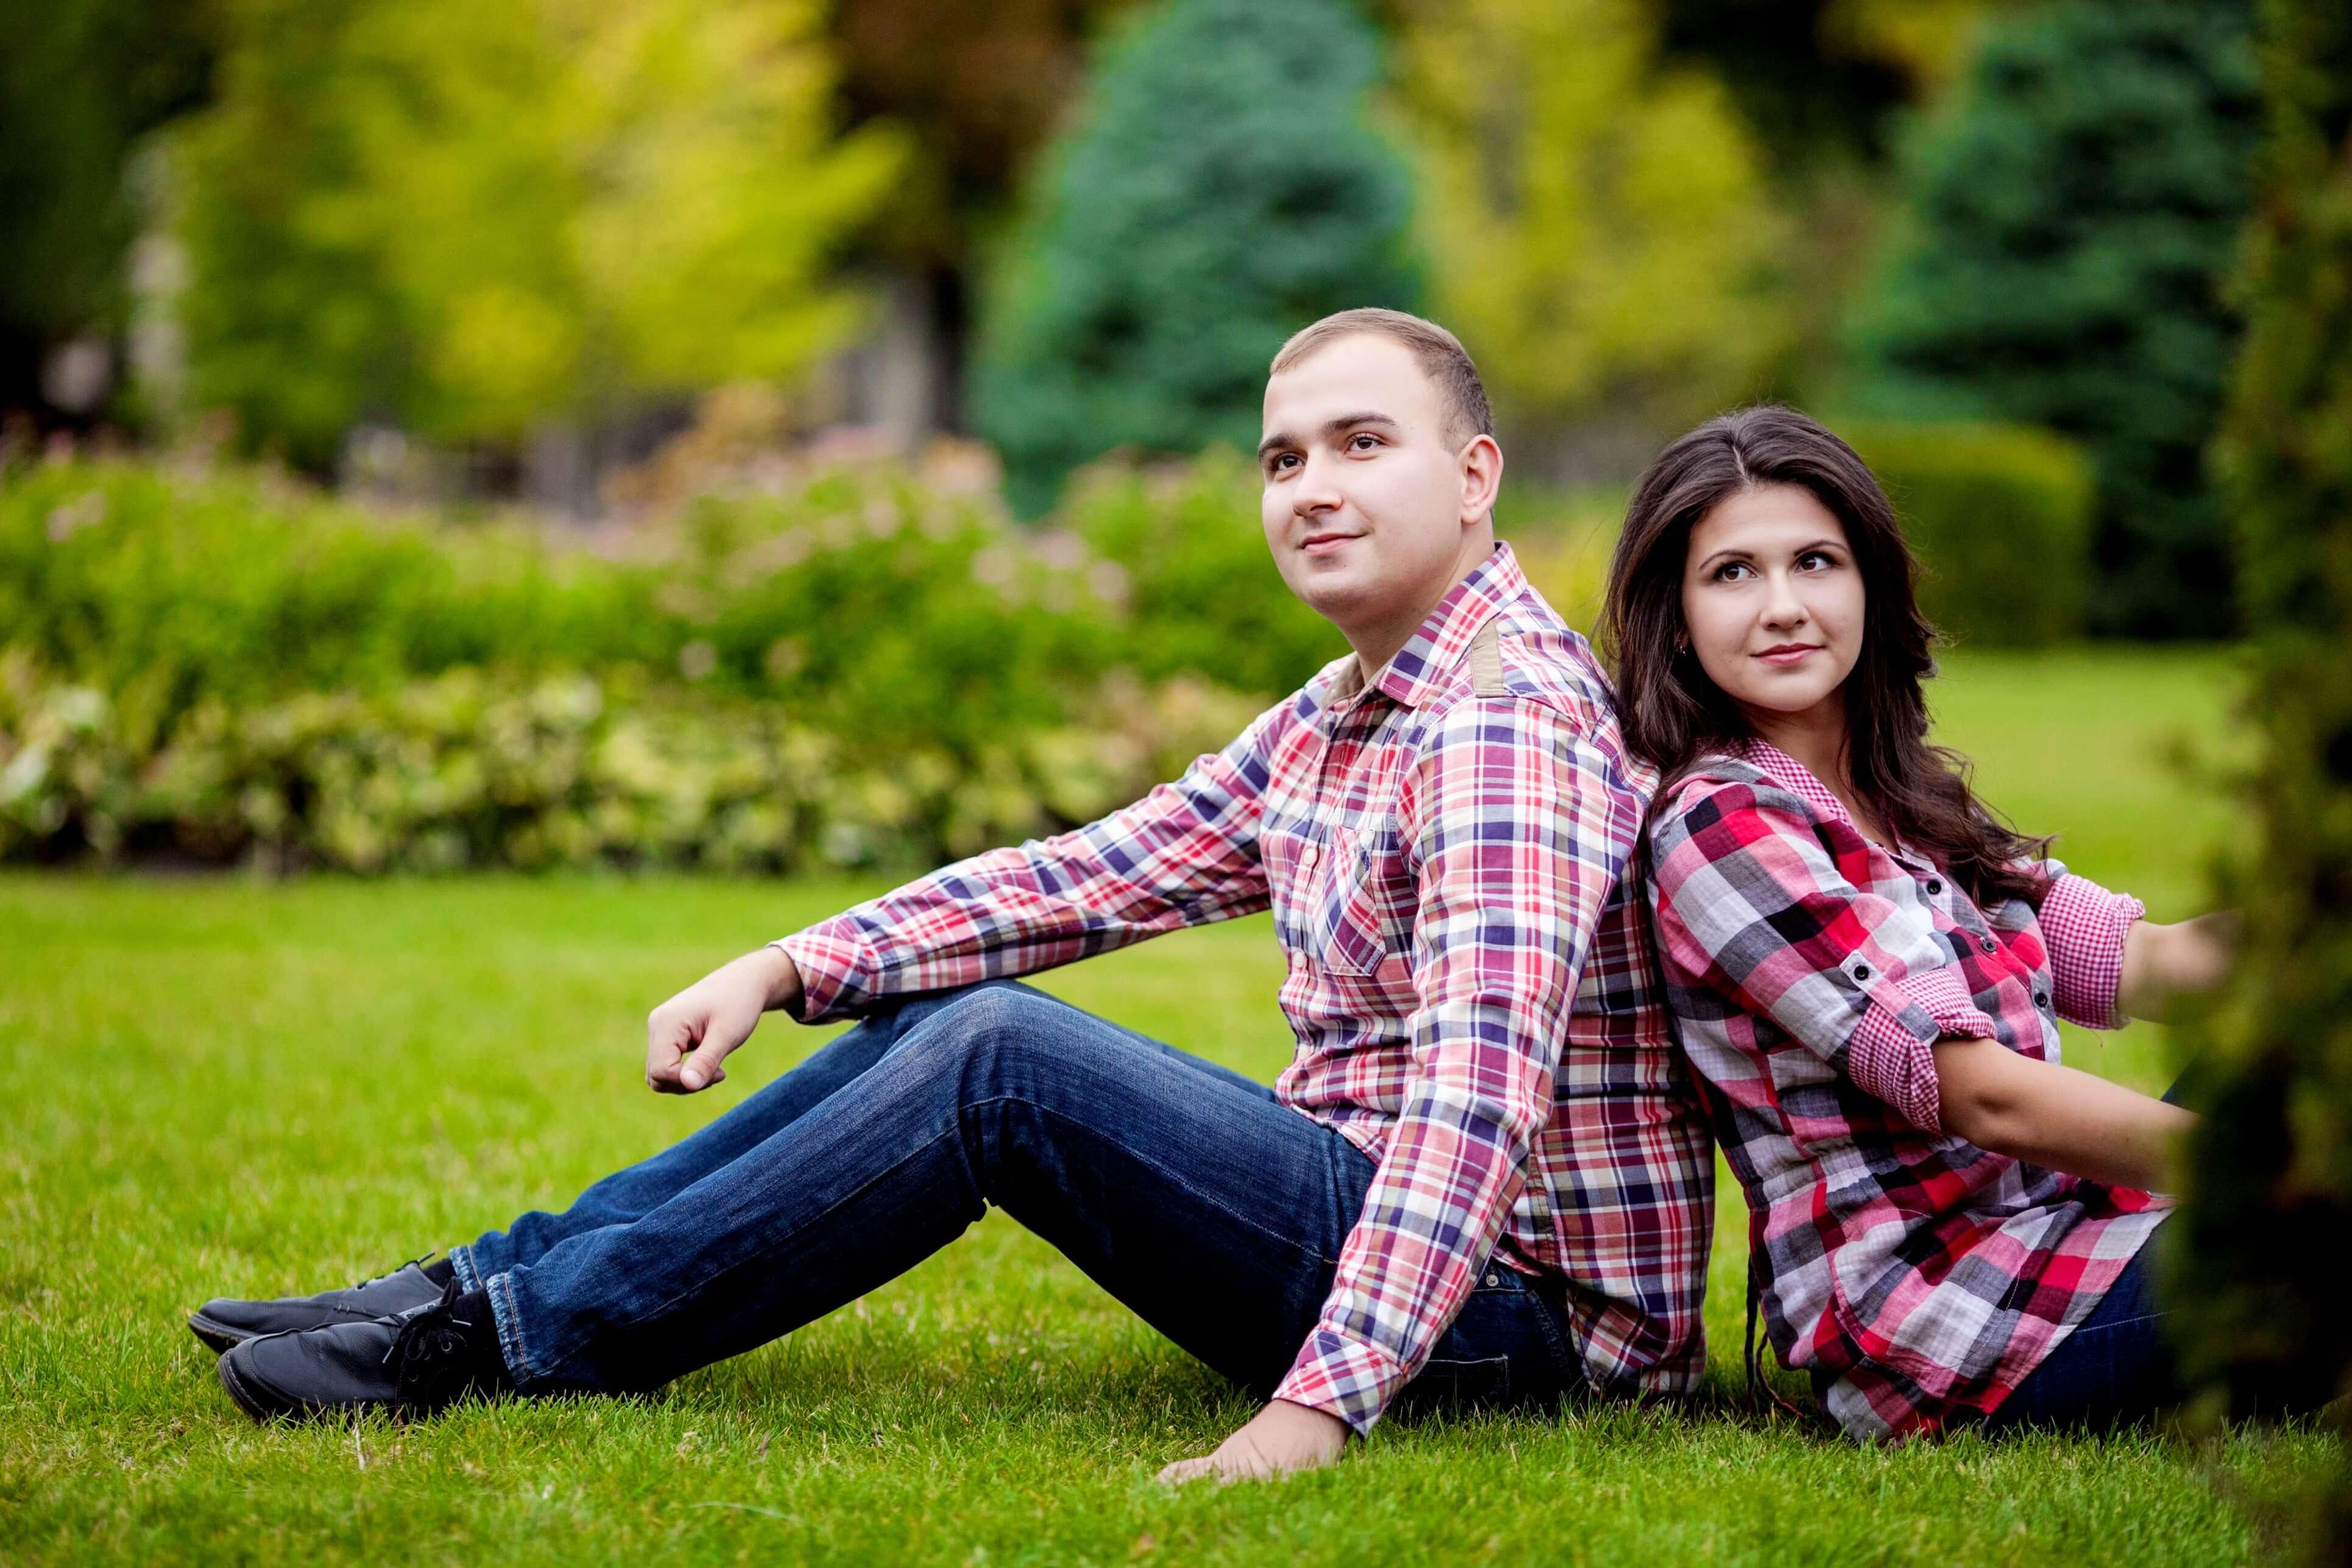 svadba-fotograf-svadebnyj-fotosemka-kiev-